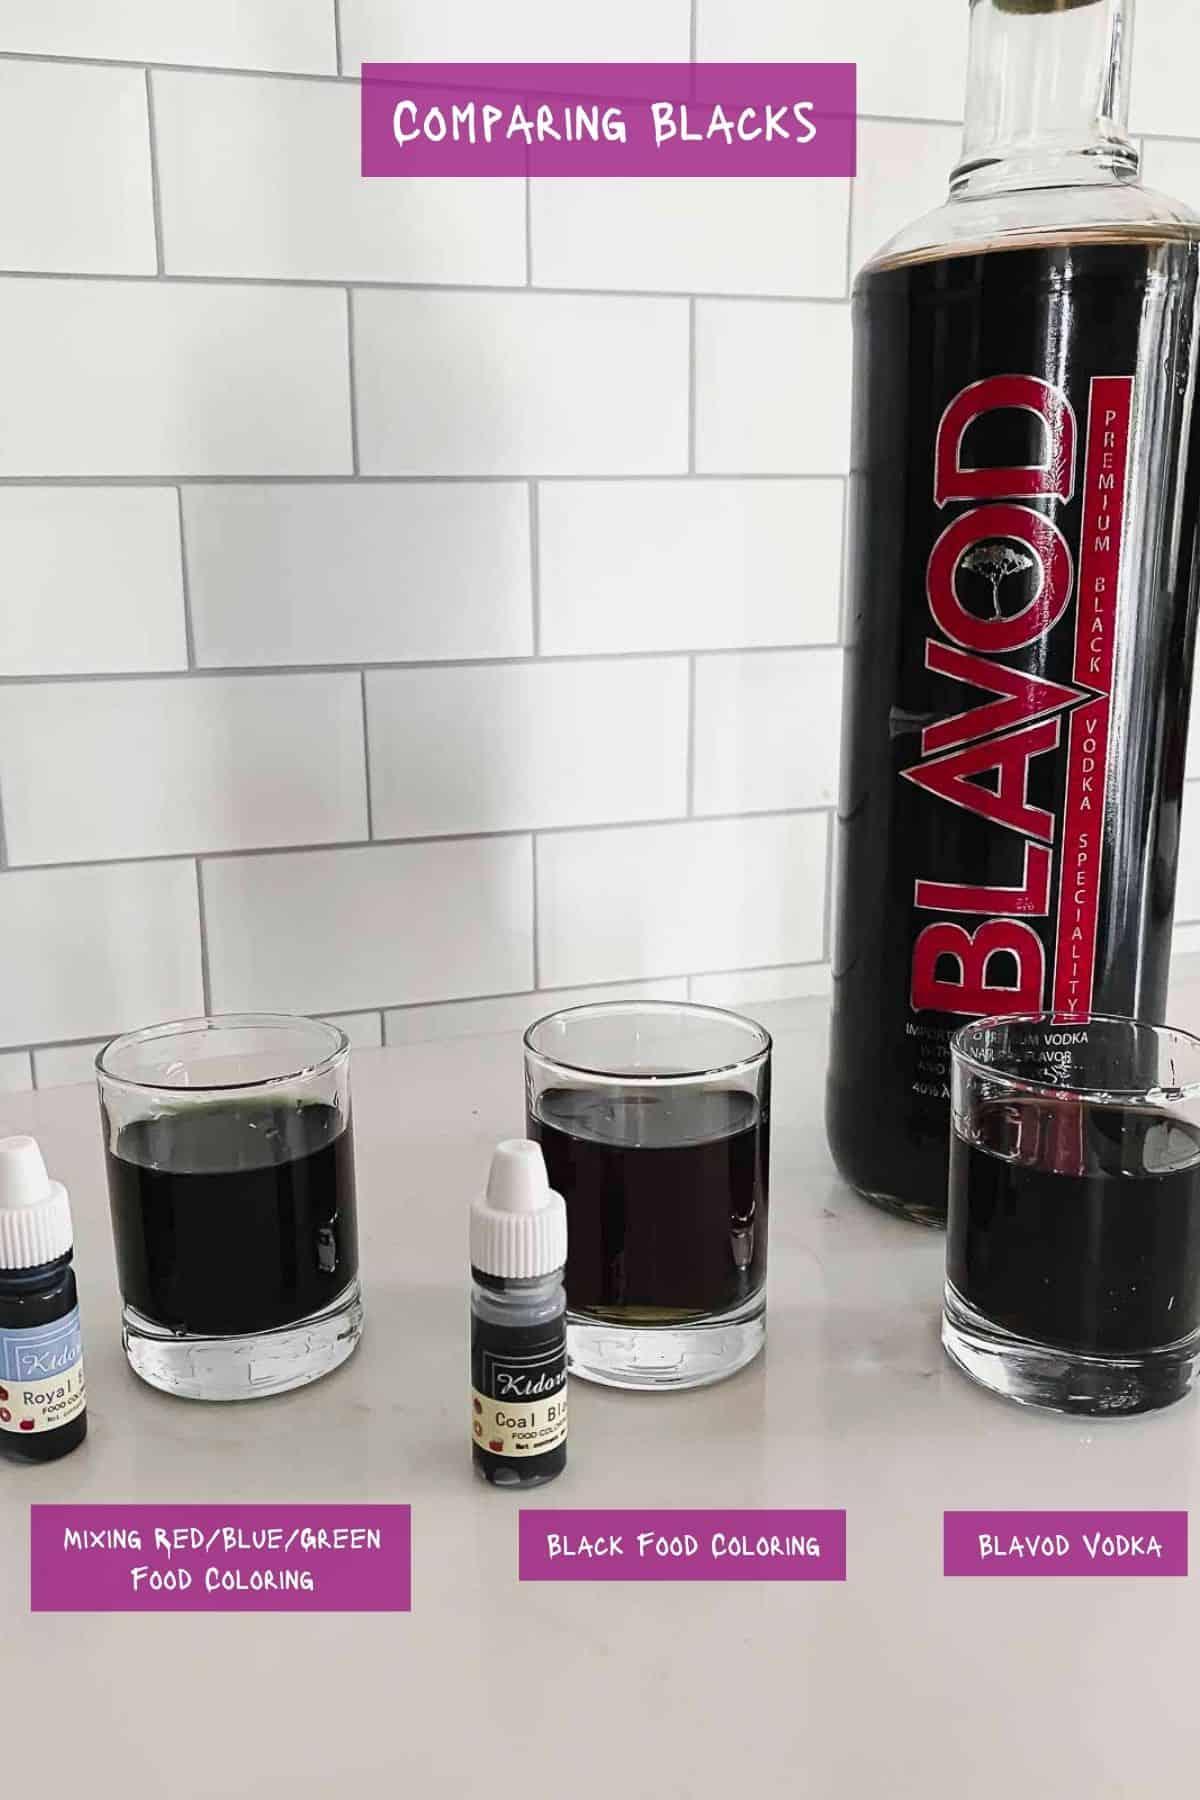 Comparing black vodka in shot glasses.